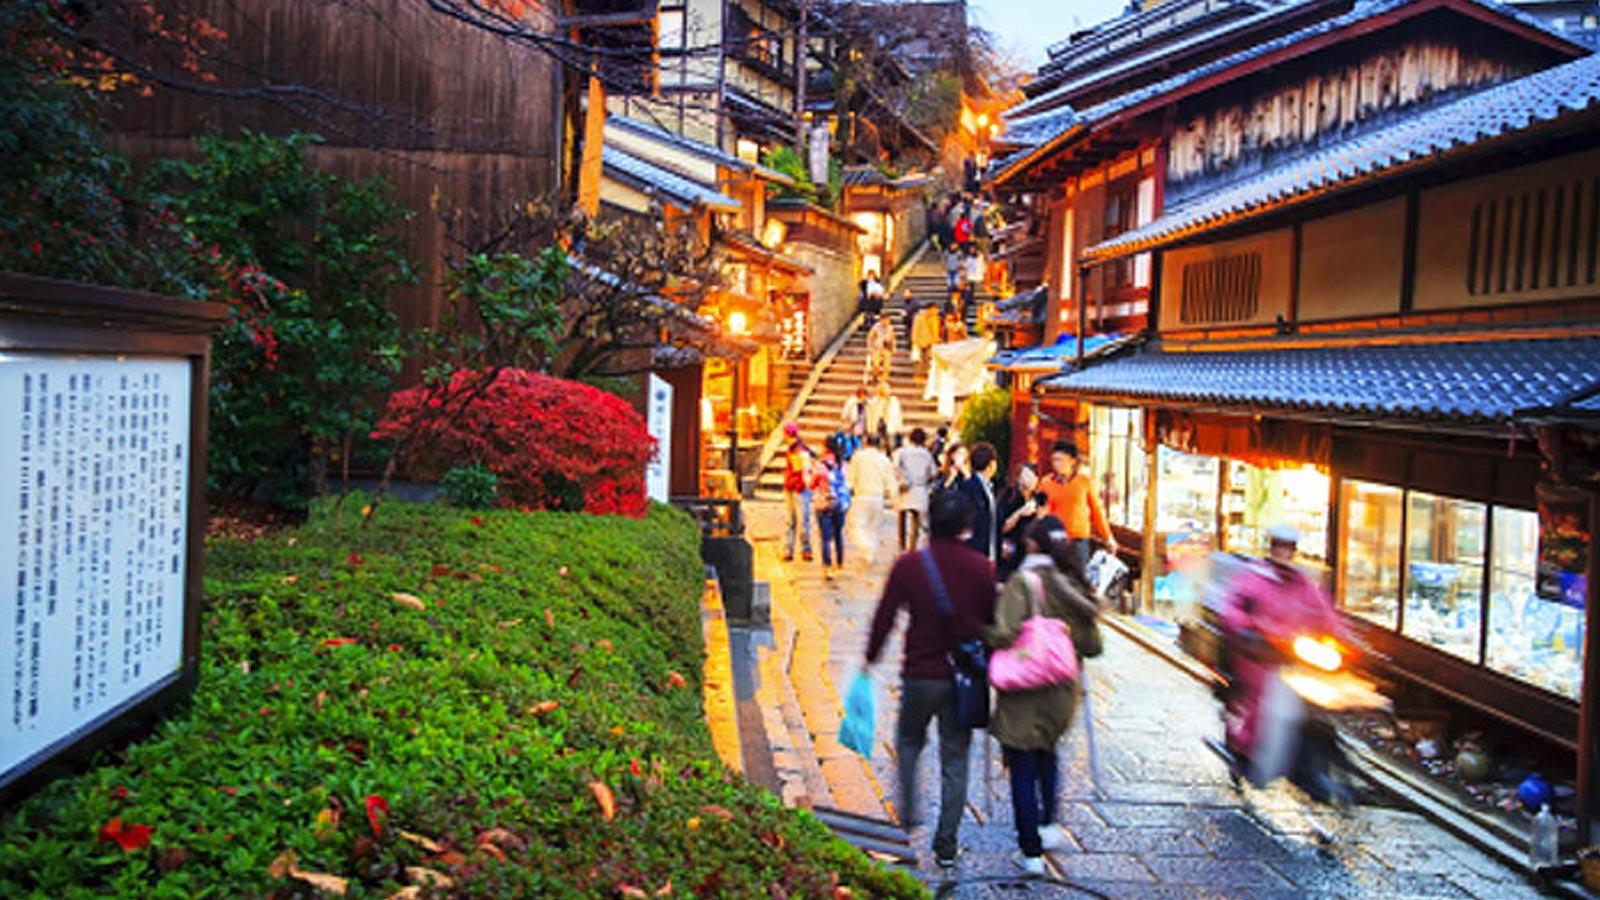 Scene of people walking down street in Japan